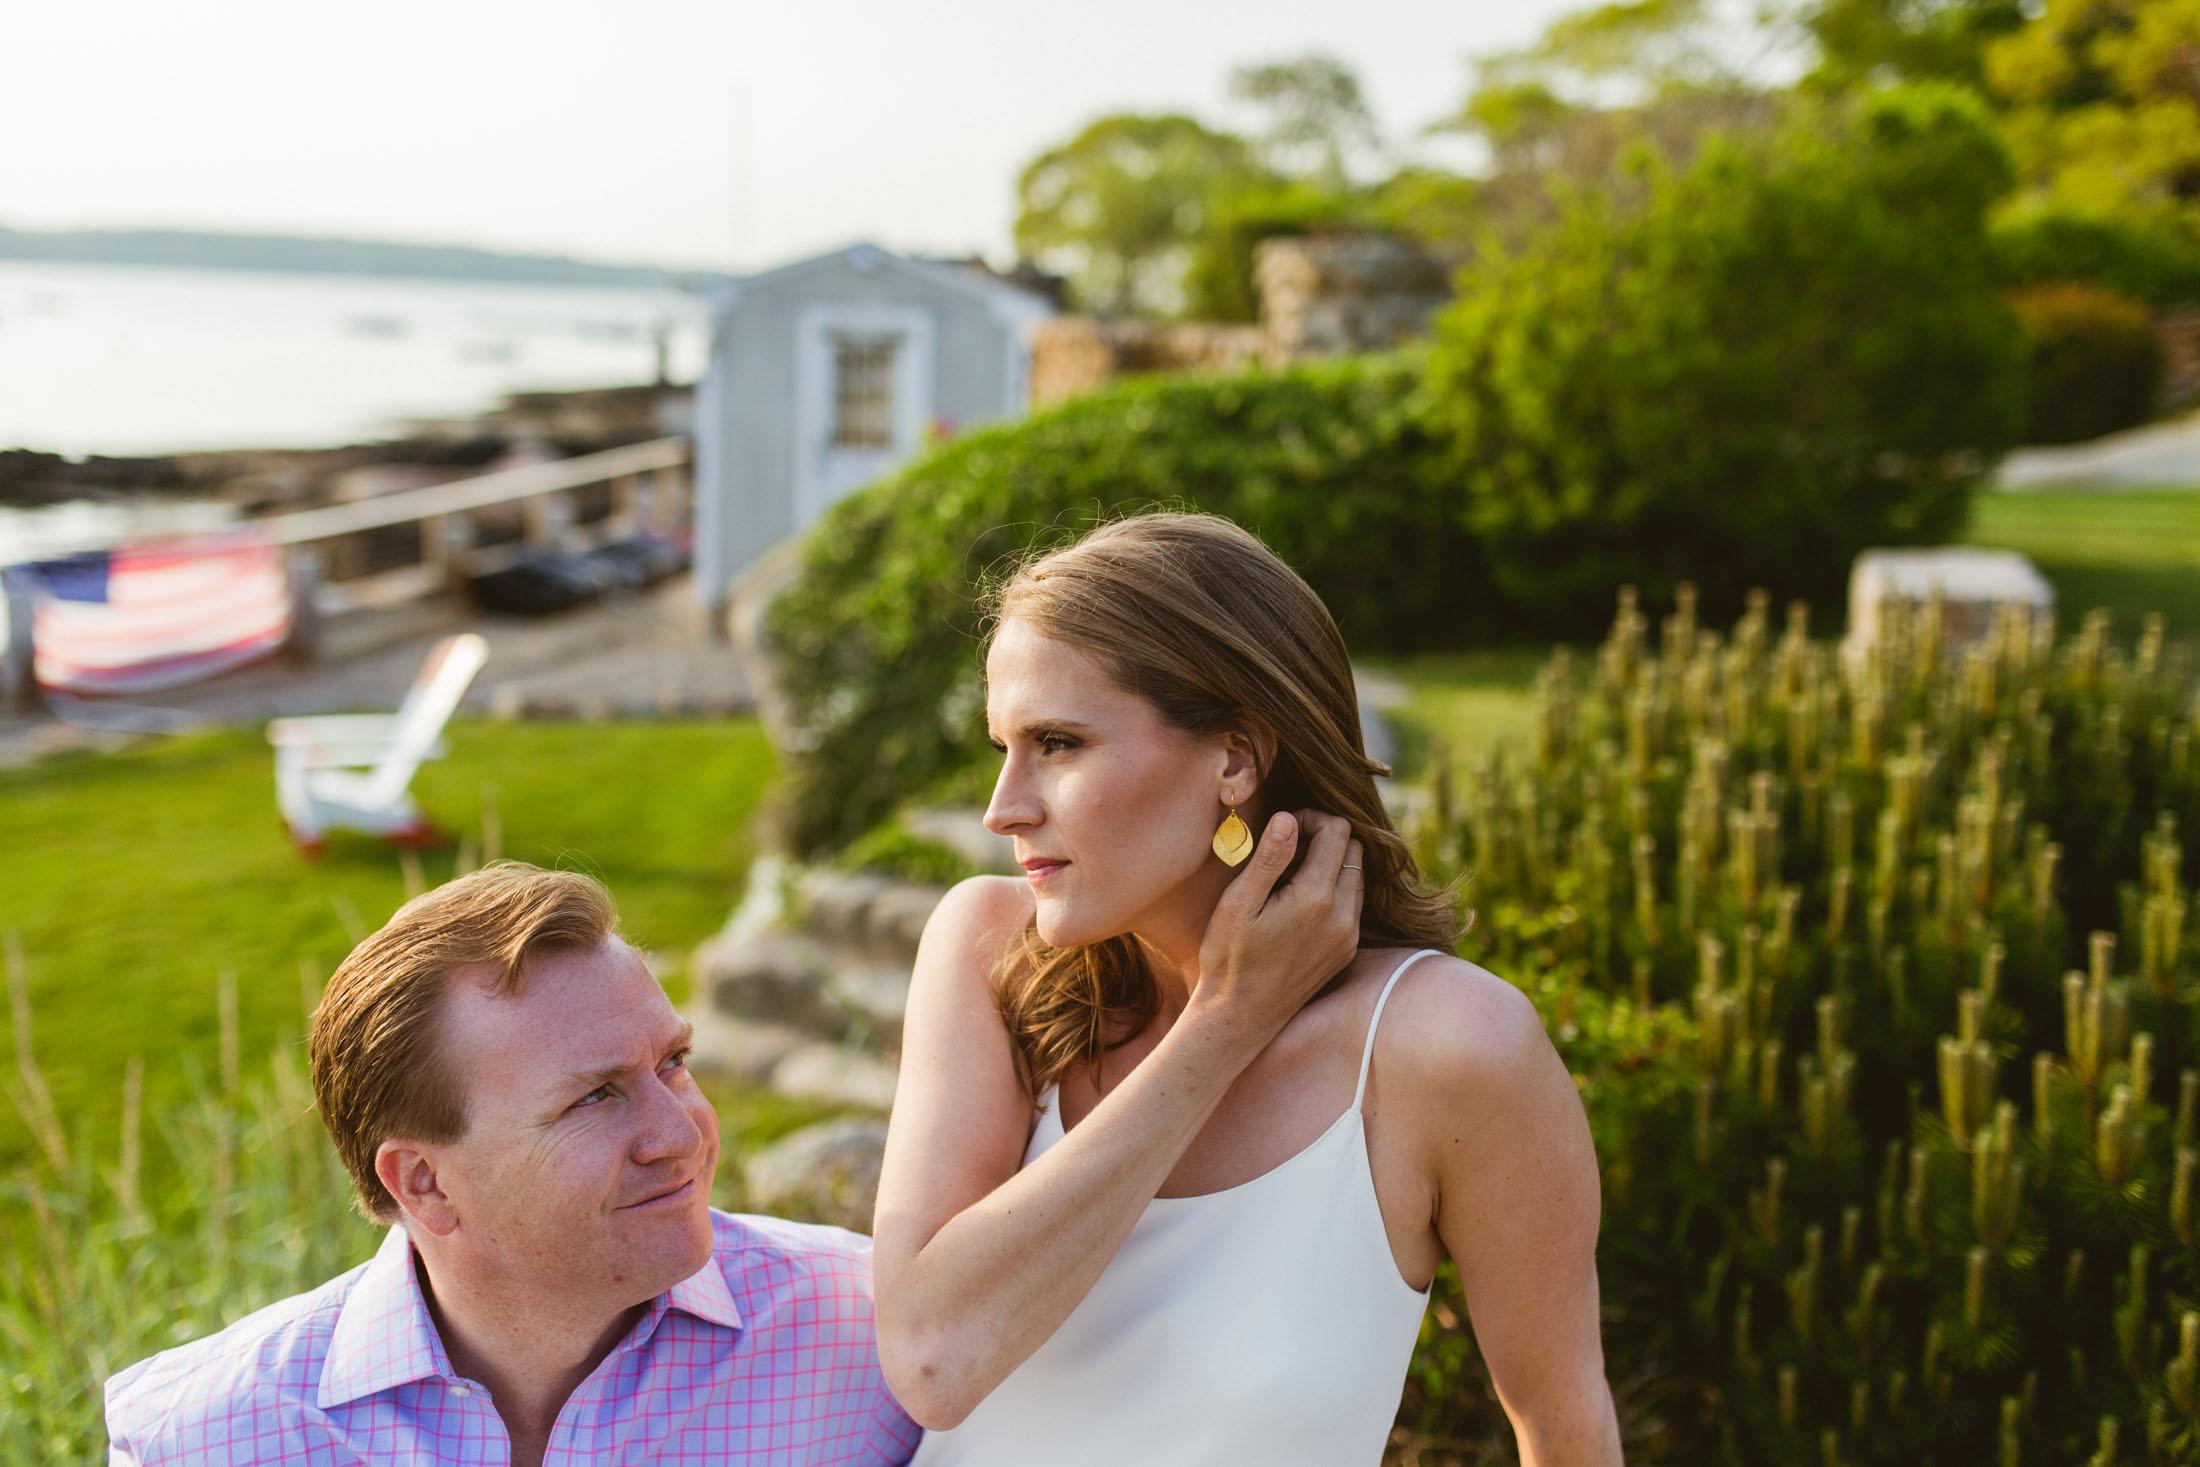 Eastern-Point-yacht-Club-Engagement-4.jpg